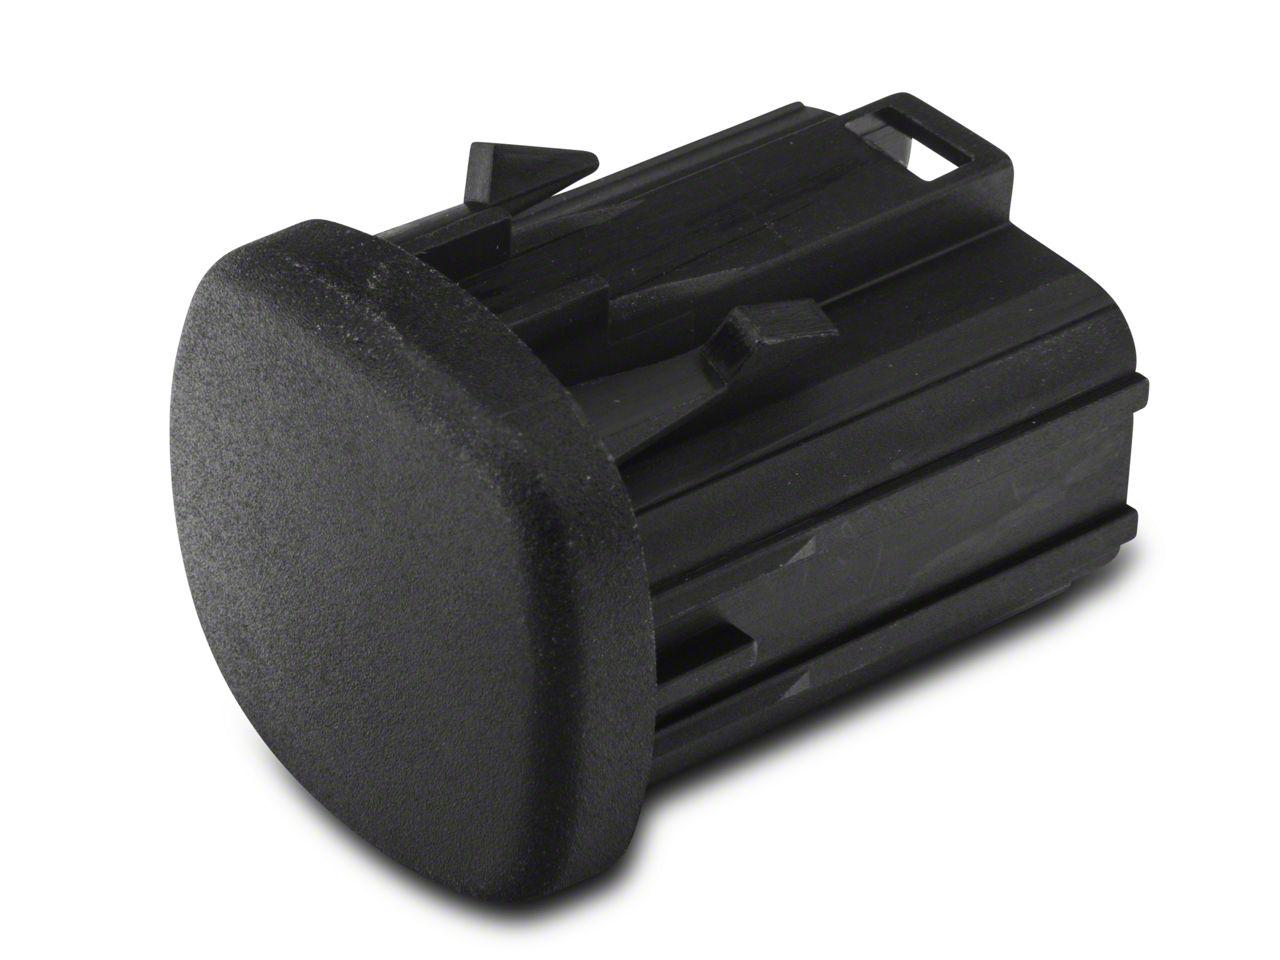 Ford Center Console Switch Delete Block (01-04 All)